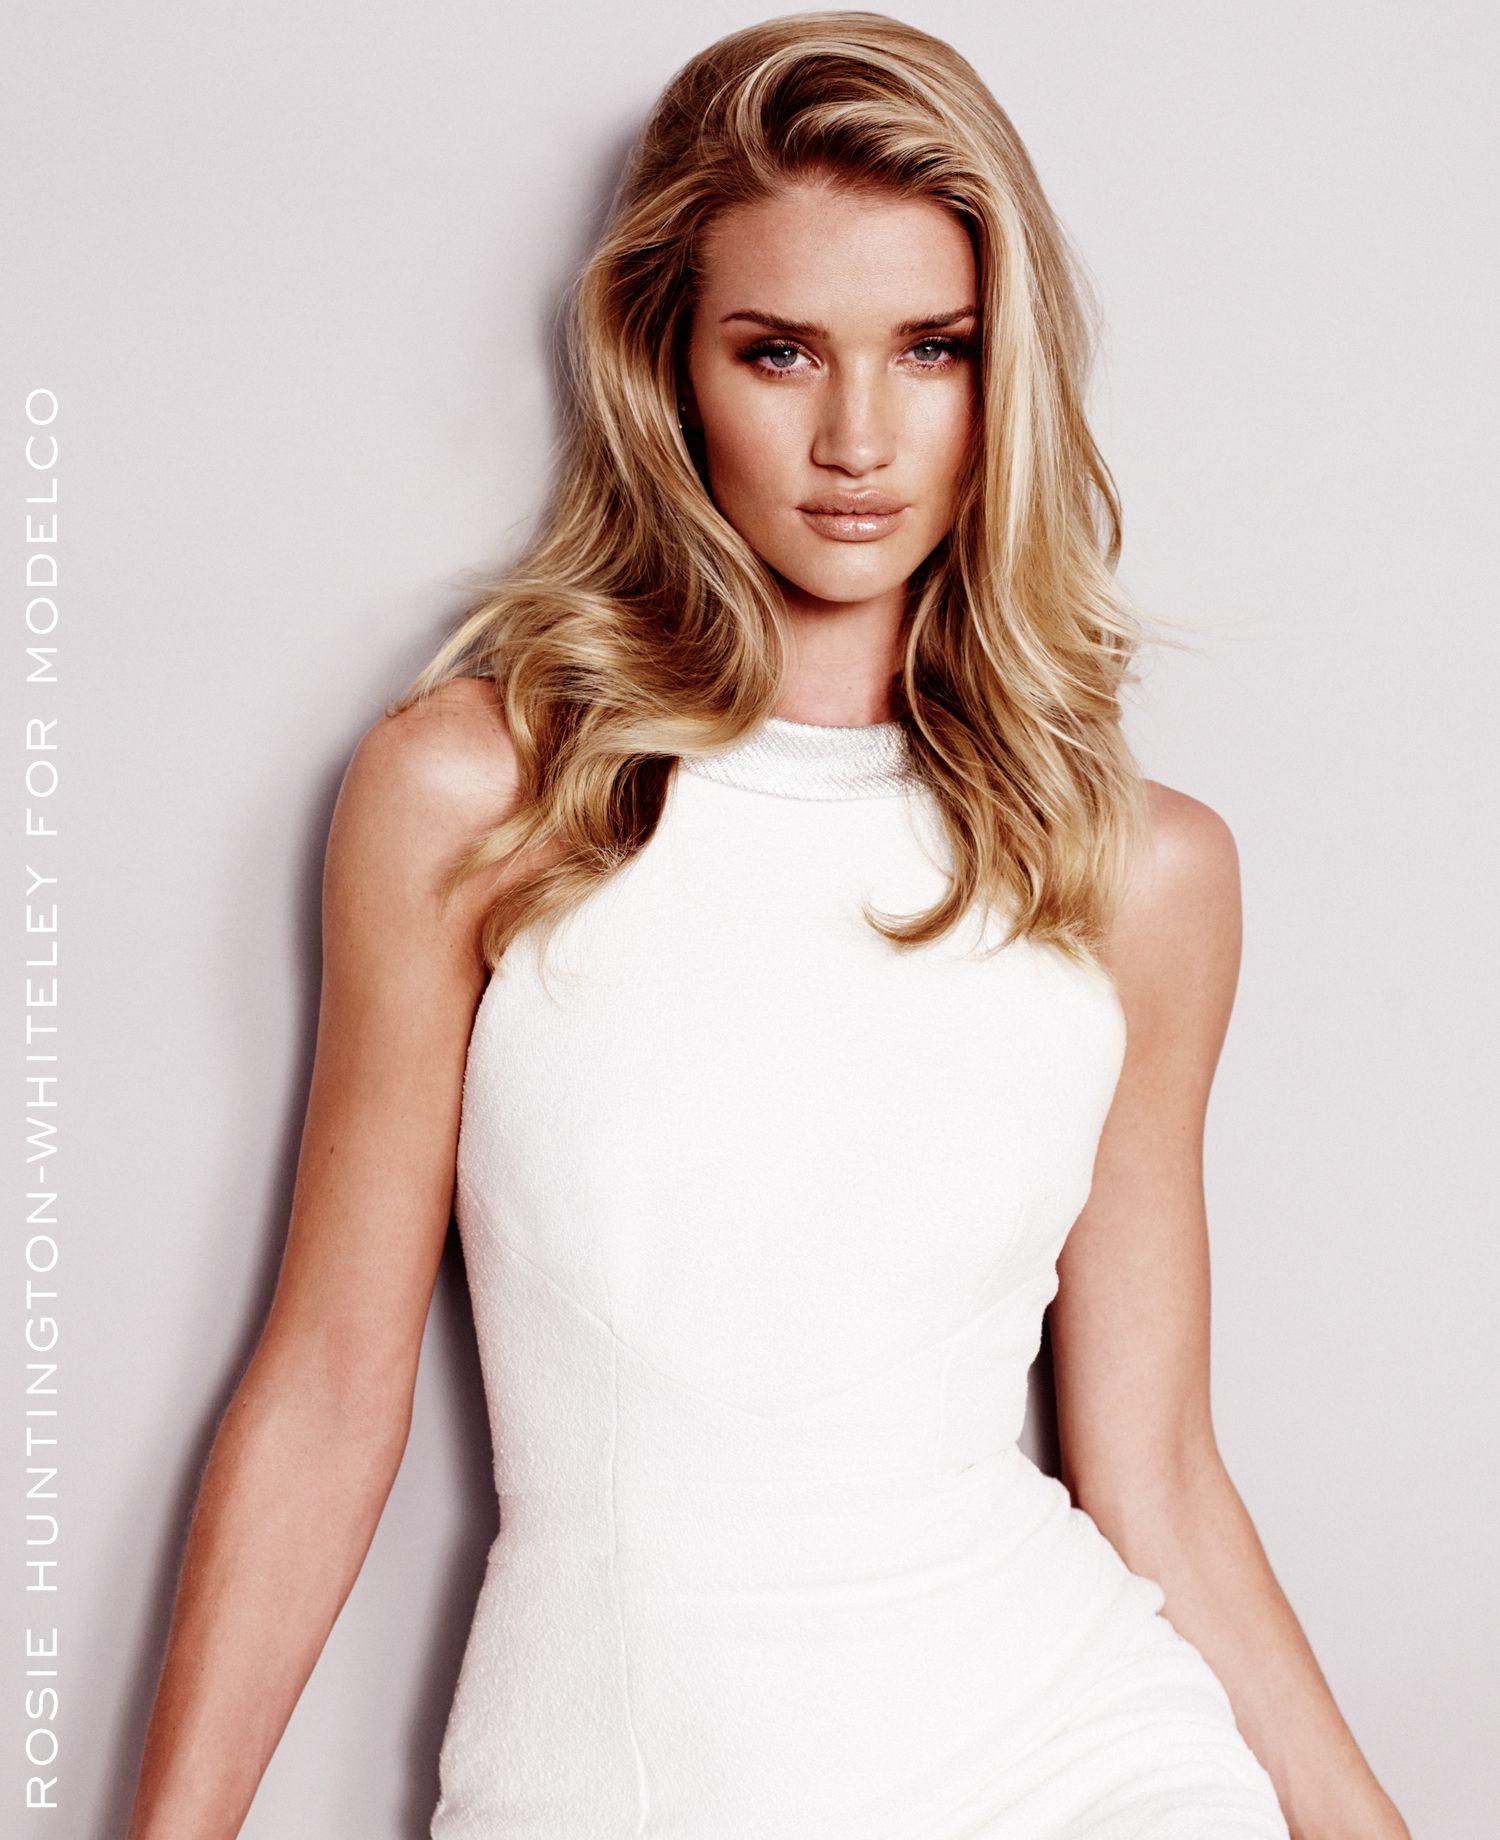 Rosie Huntington Whiteley for ModelCo